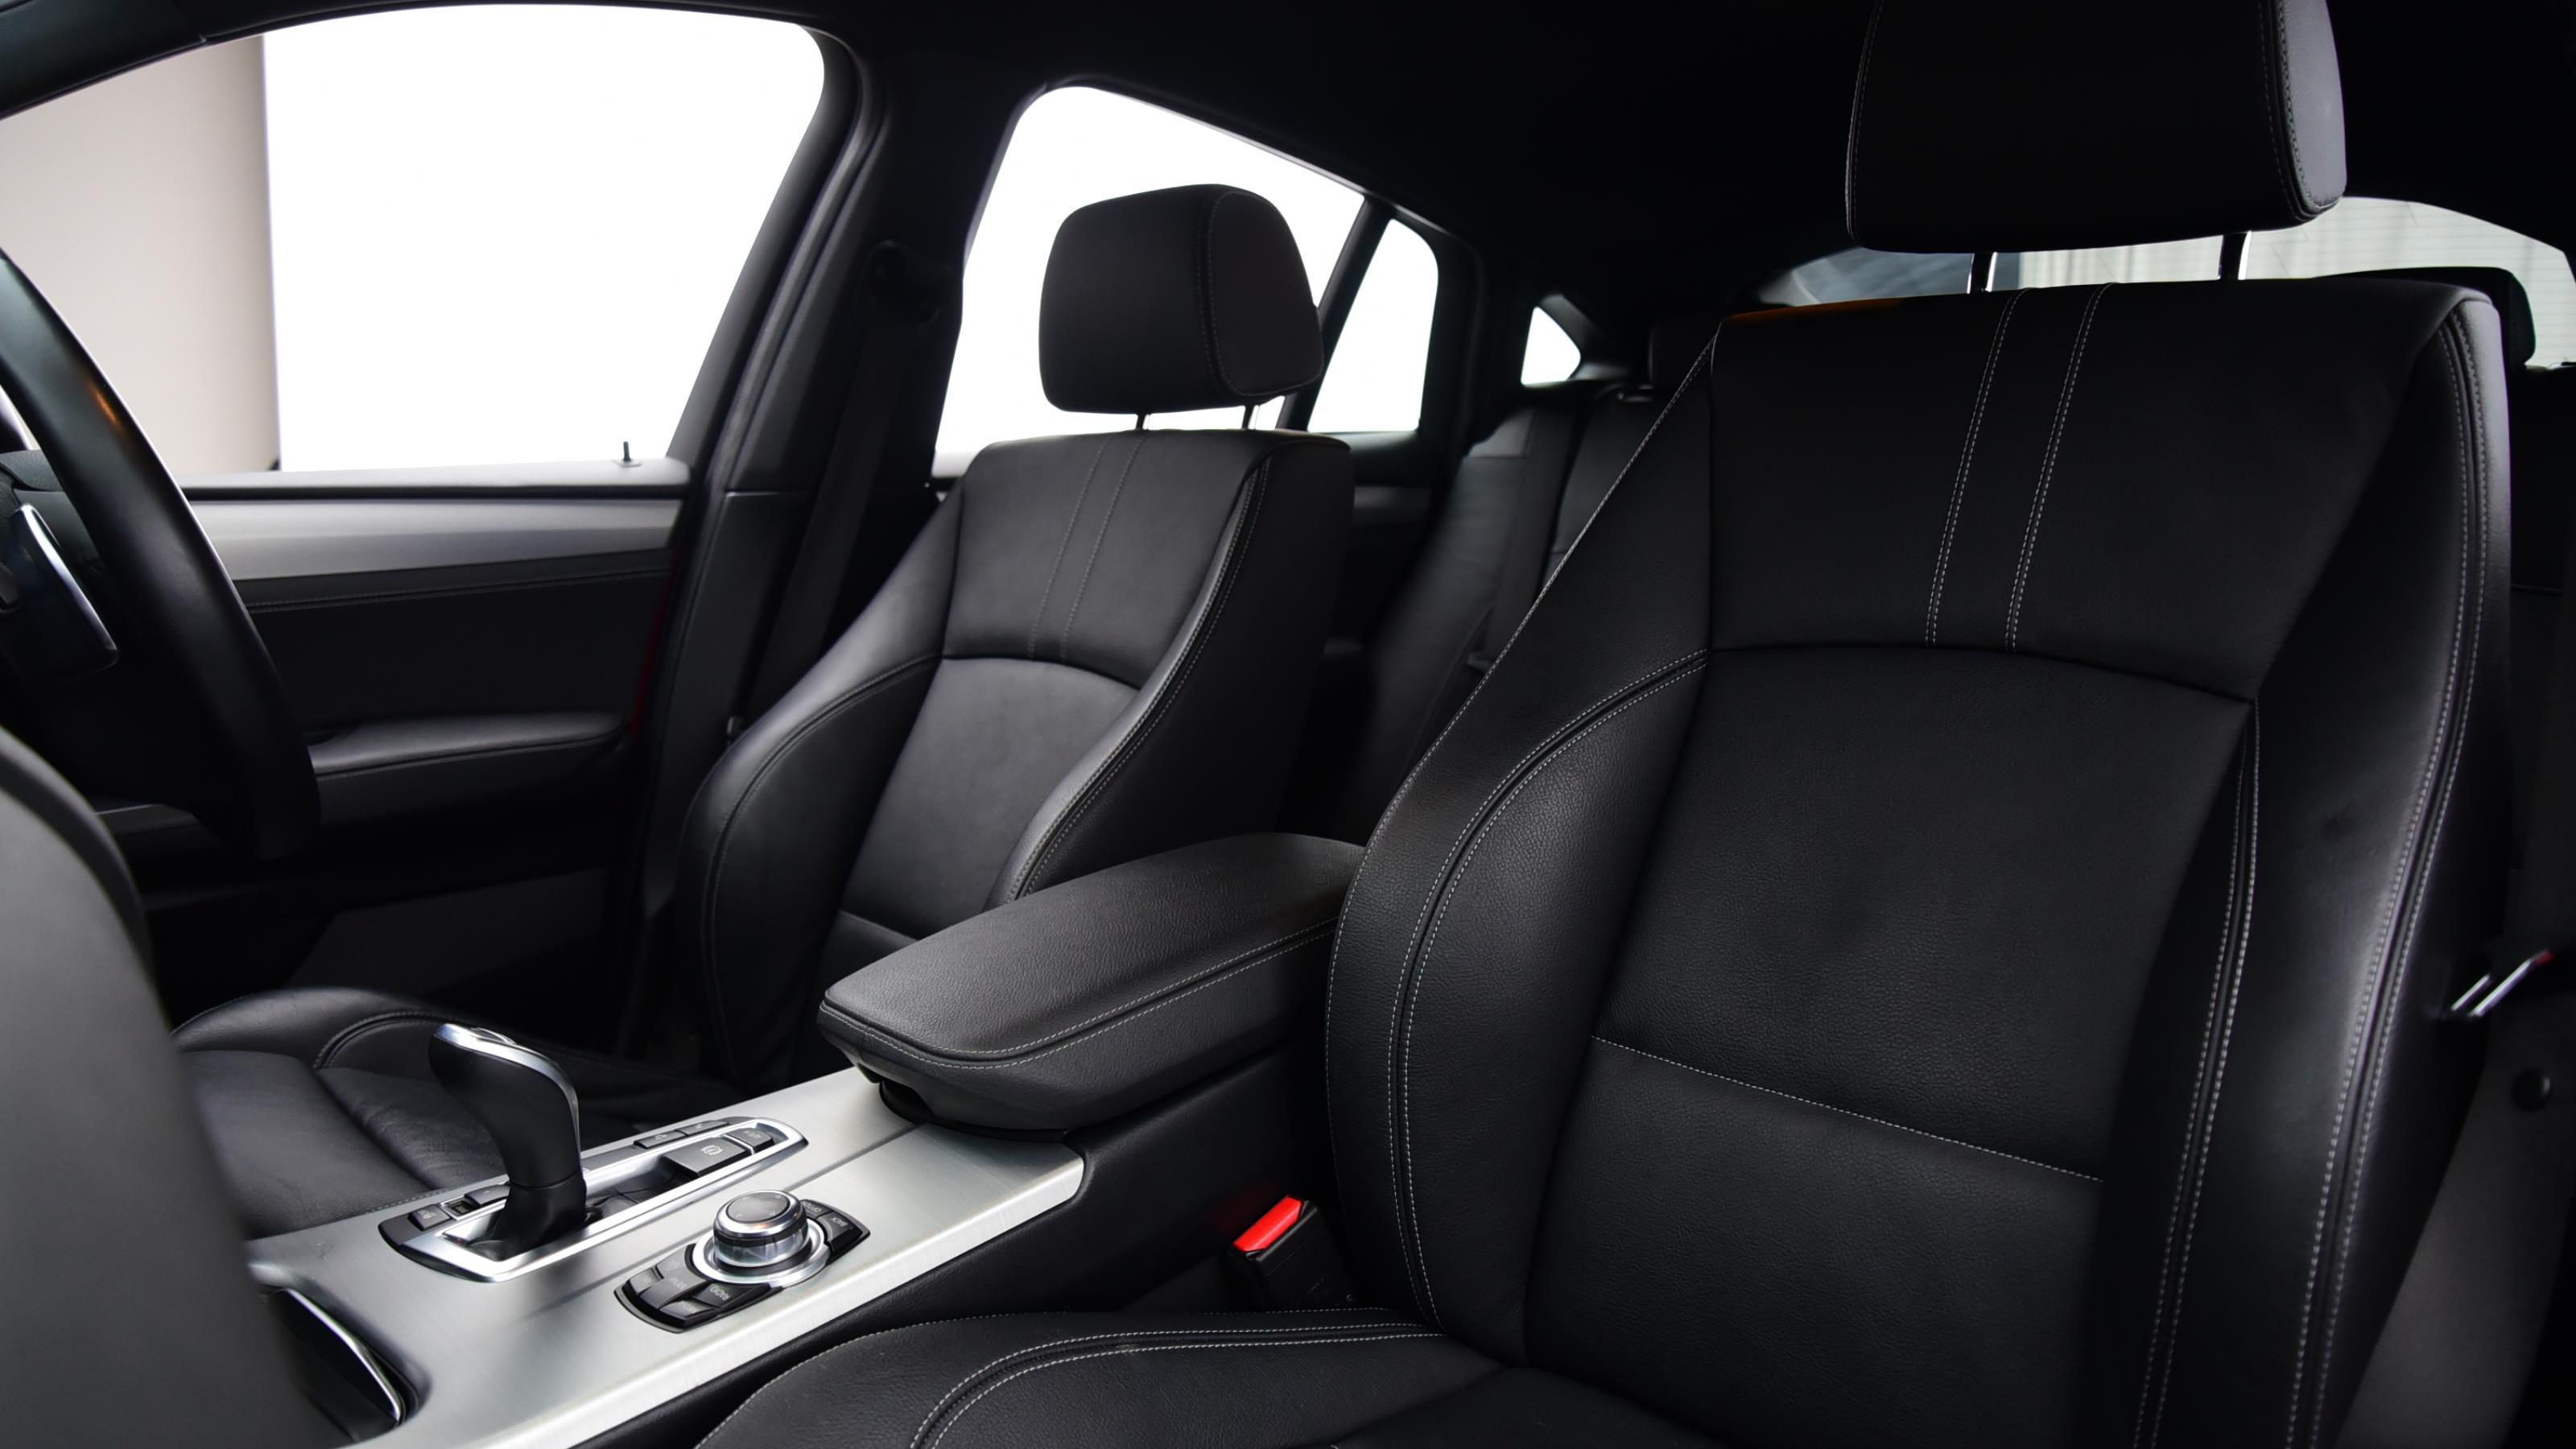 Used 2016 BMW X4 xDrive30d M Sport 5dr Step Auto RED at Saxton4x4